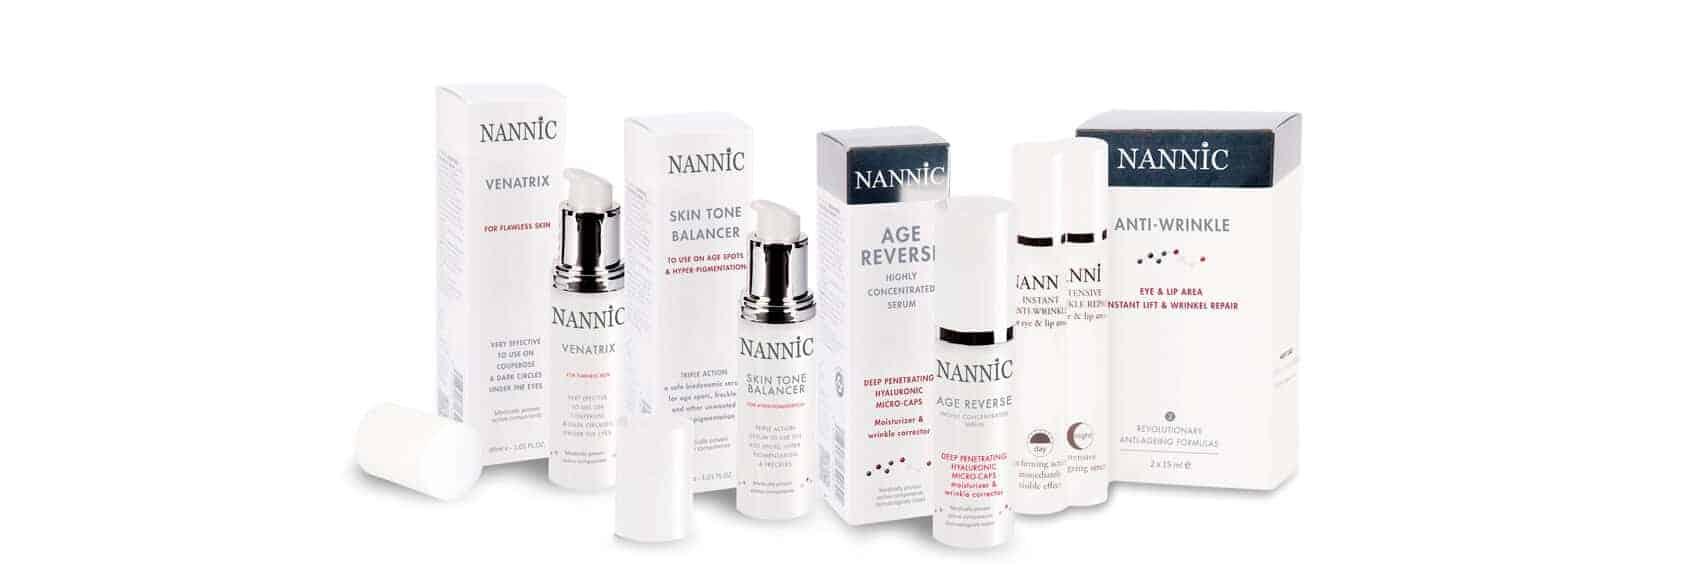 nannic banner